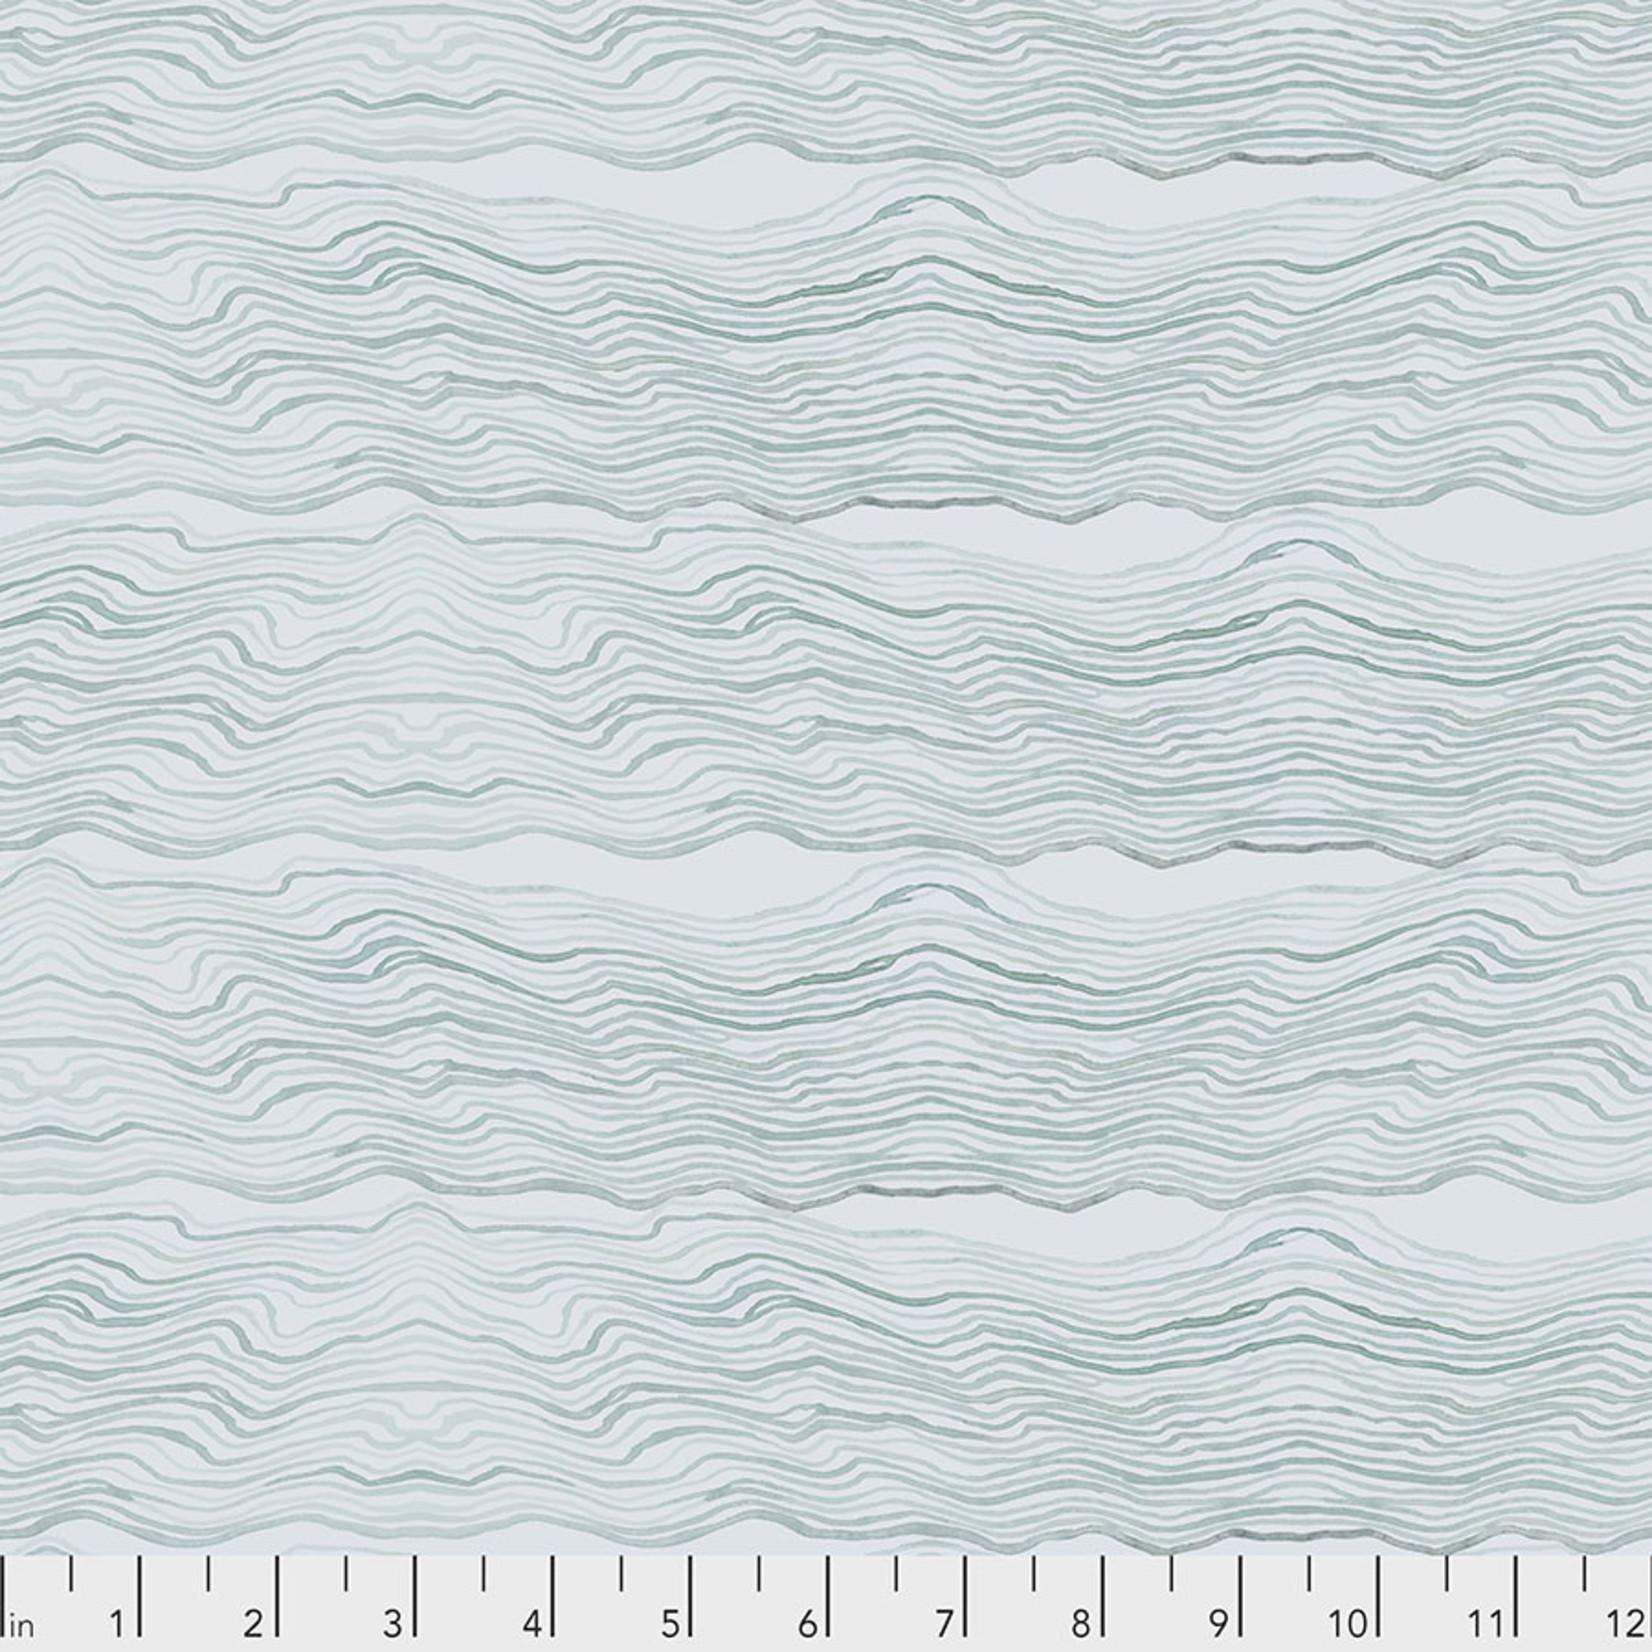 Free Spirit Time and Tide, Ebb & Flow - Ocean - $0.16 per cm or $16/m